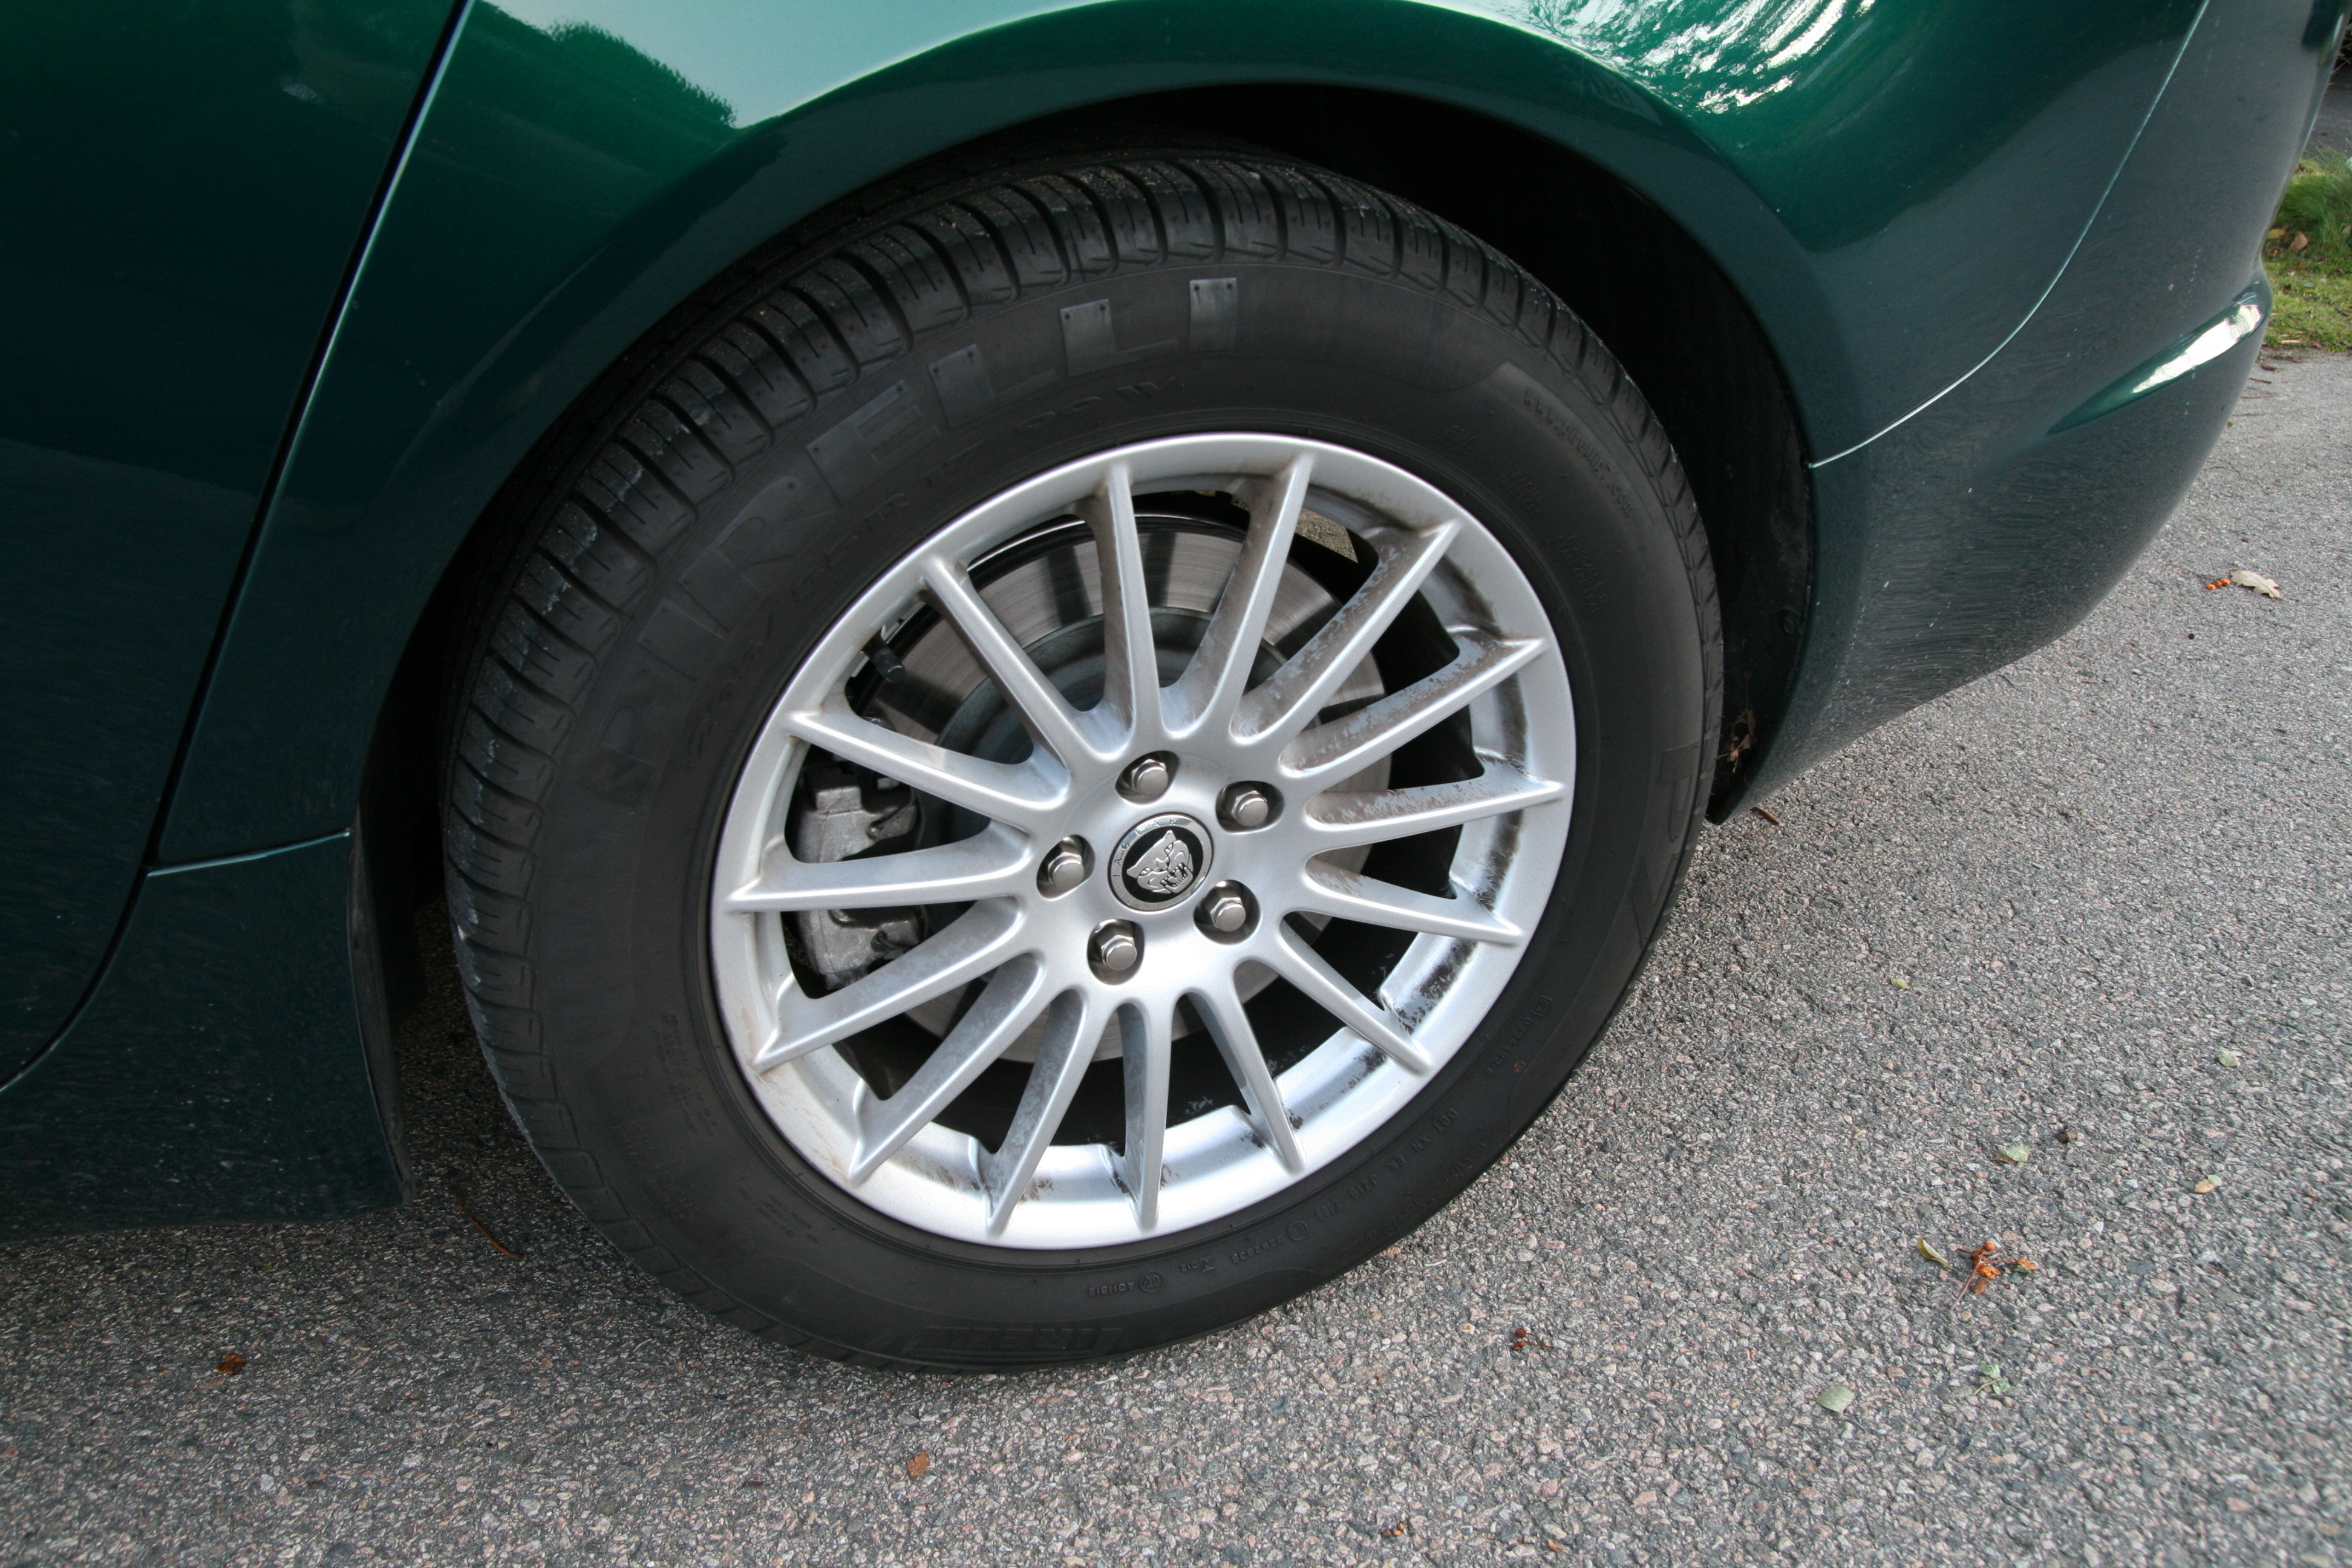 images chopper oldtimer design wheel free photo automobile automotive spoke rim motorcycle wheels auto tire make vehicle land jaguar car spokes en